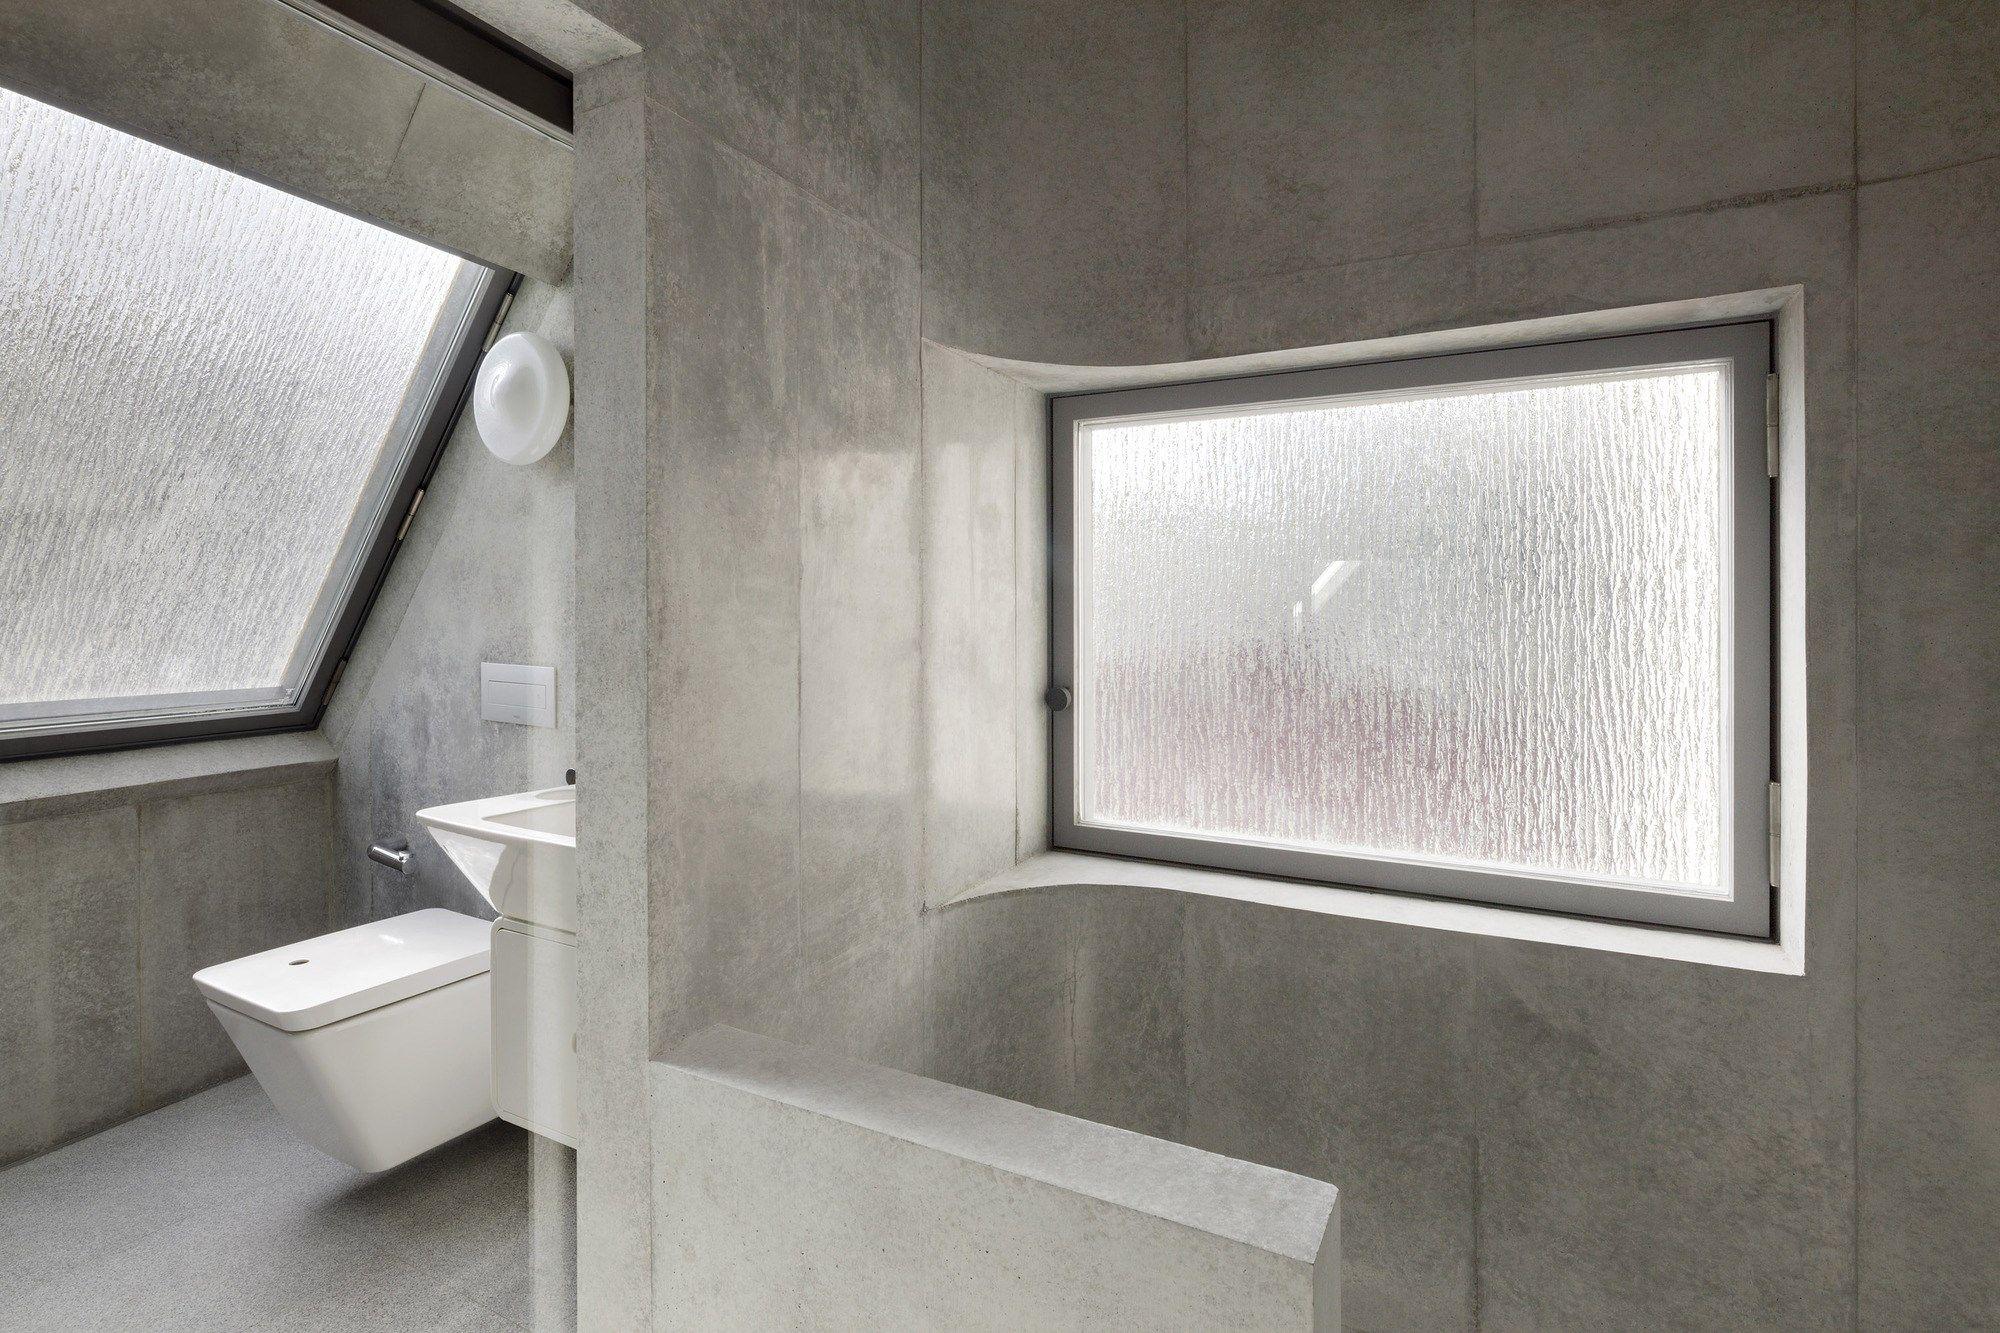 A' House by Wiel Arets Architects / 坐落東京市中心西麻布的 3 層樓混凝土私宅,空間規劃上既要對外開放,又要保有 ...